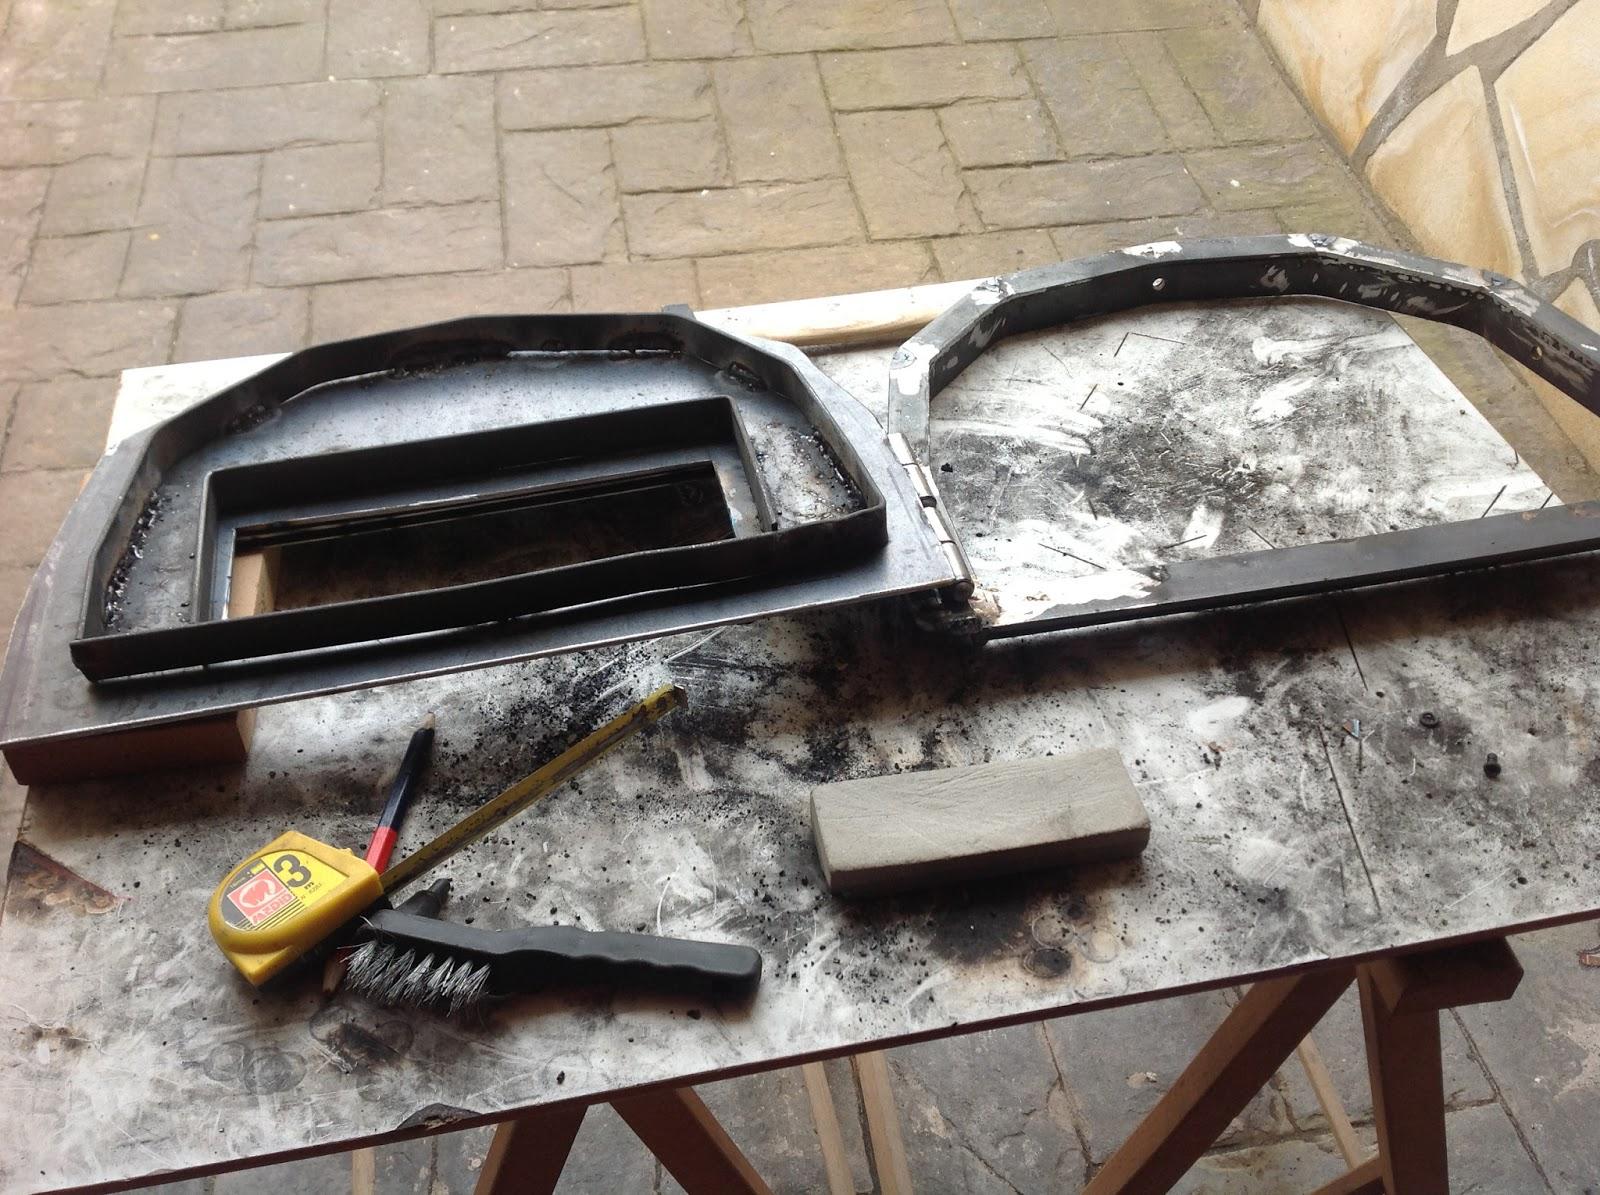 Construccion de horno de le a - Materiales para hacer un horno de lena ...